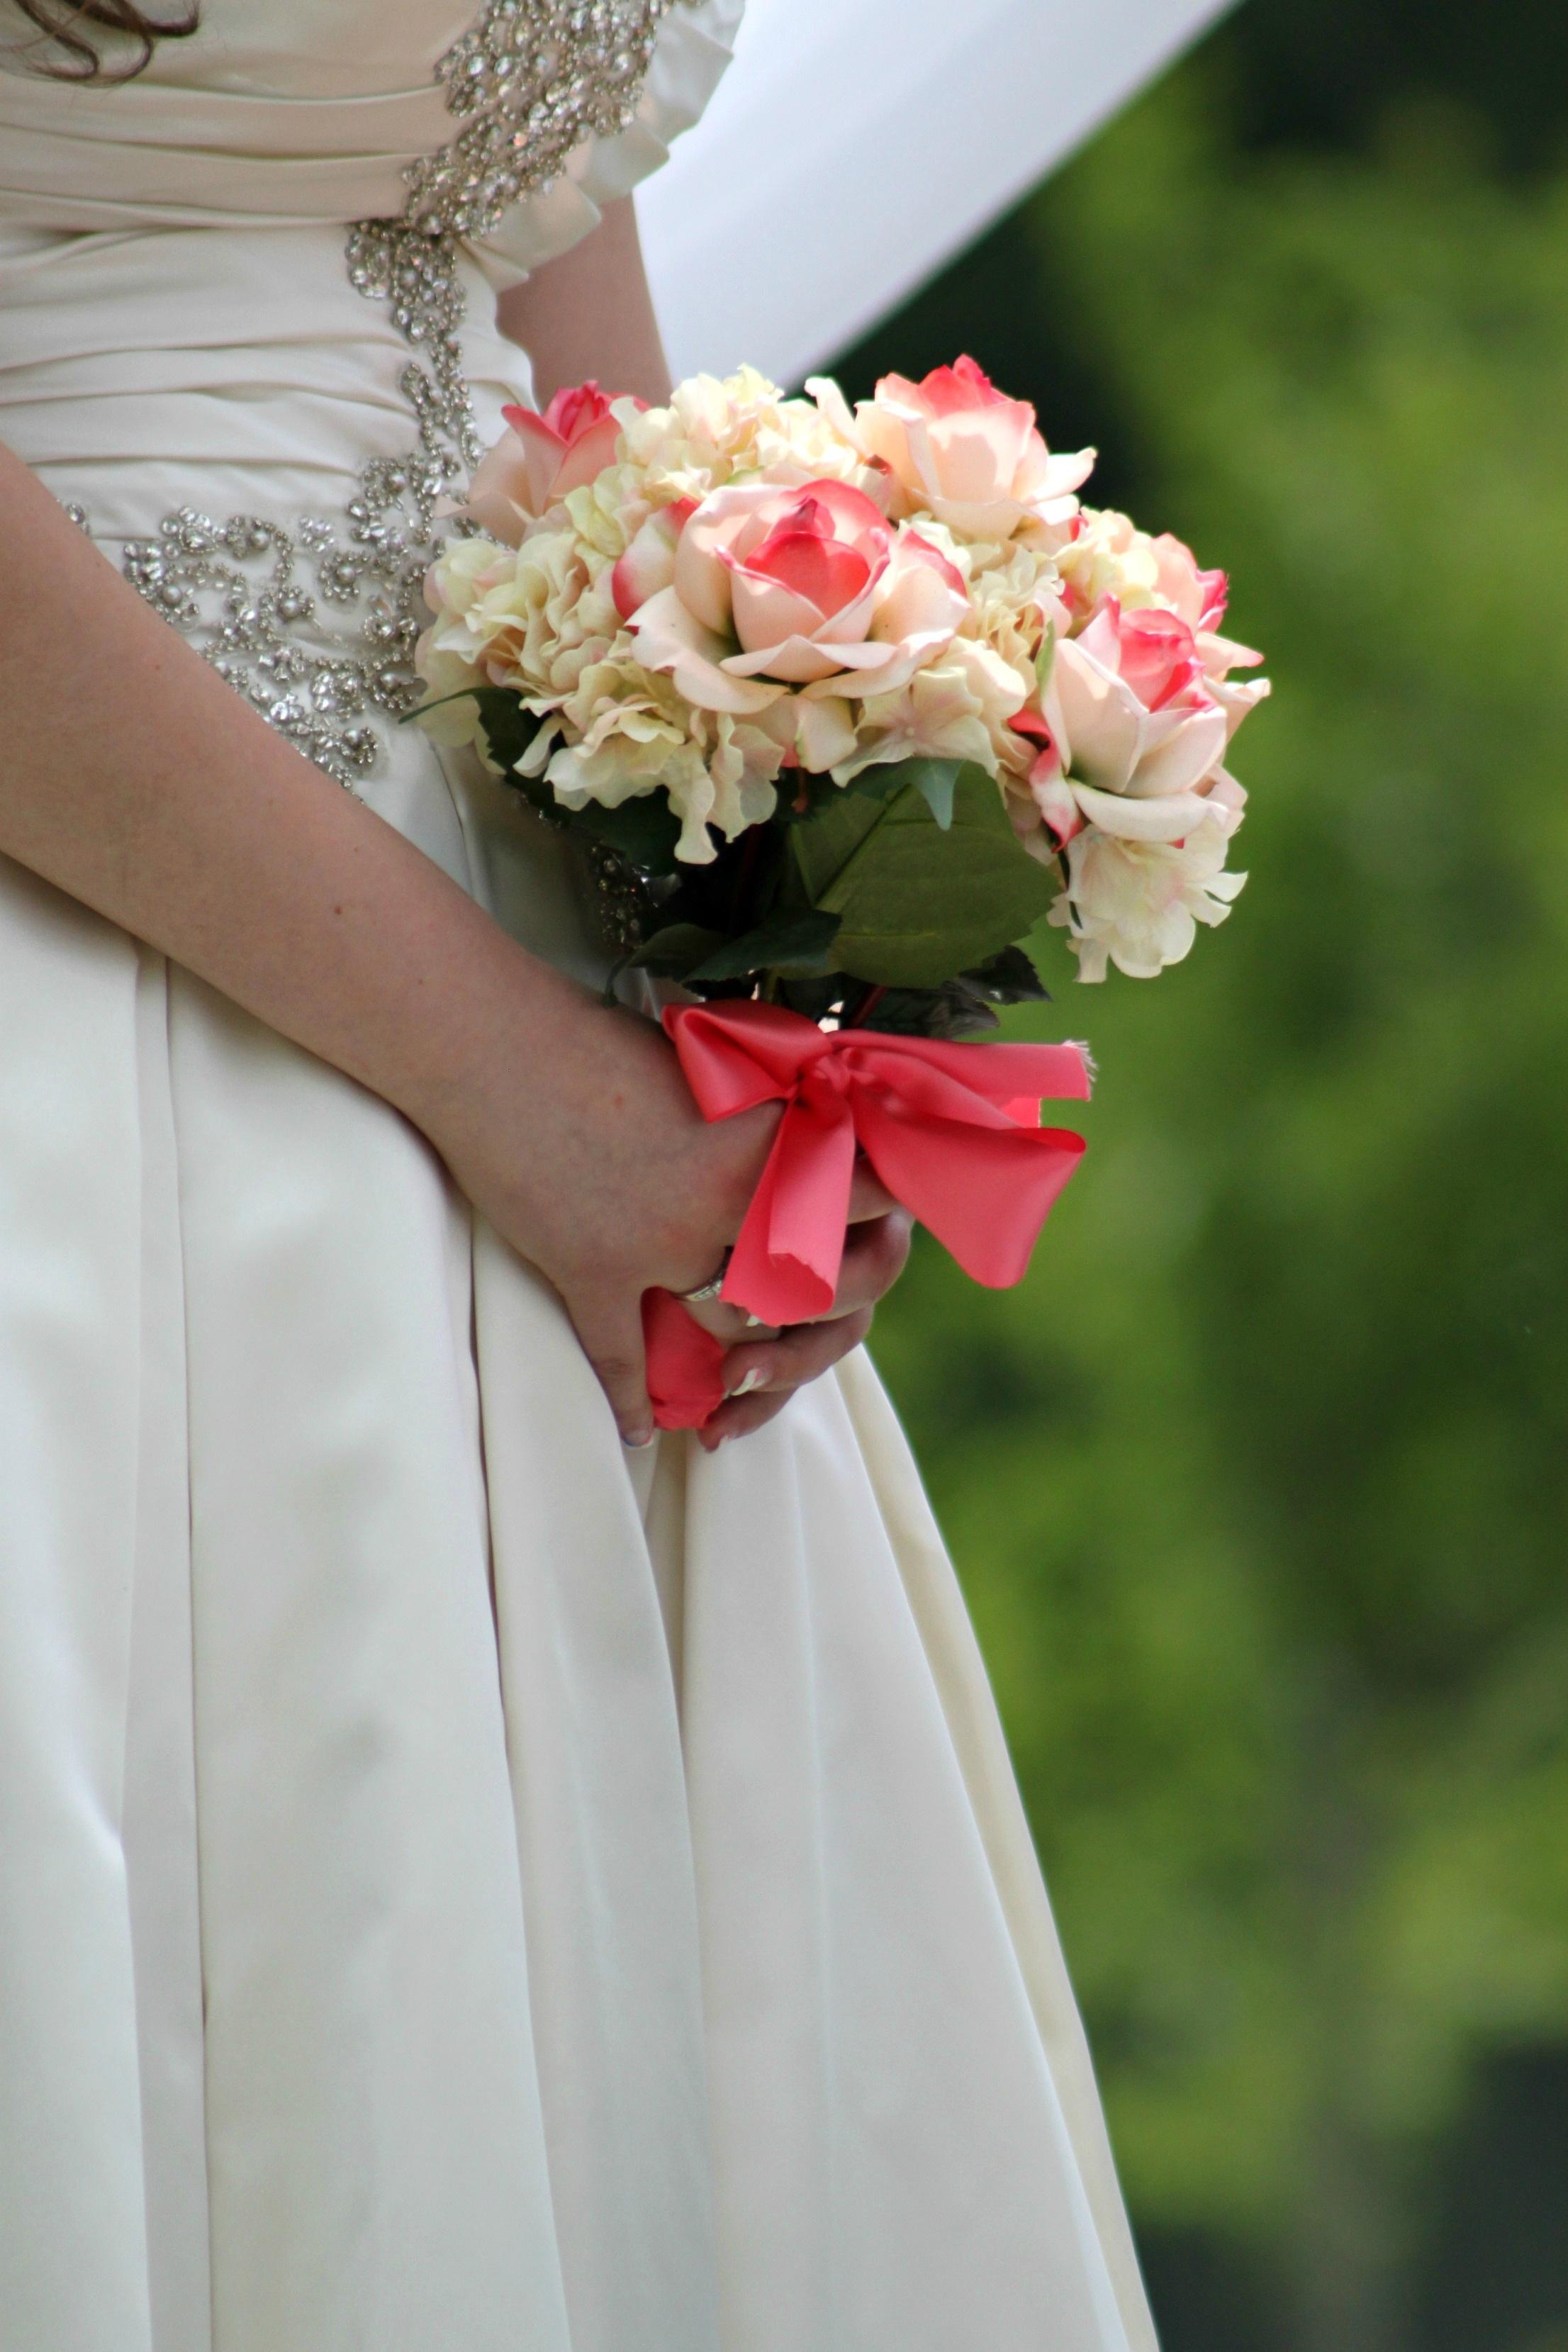 Free Images : plant, woman, white, petal, spring, pink, wedding ...